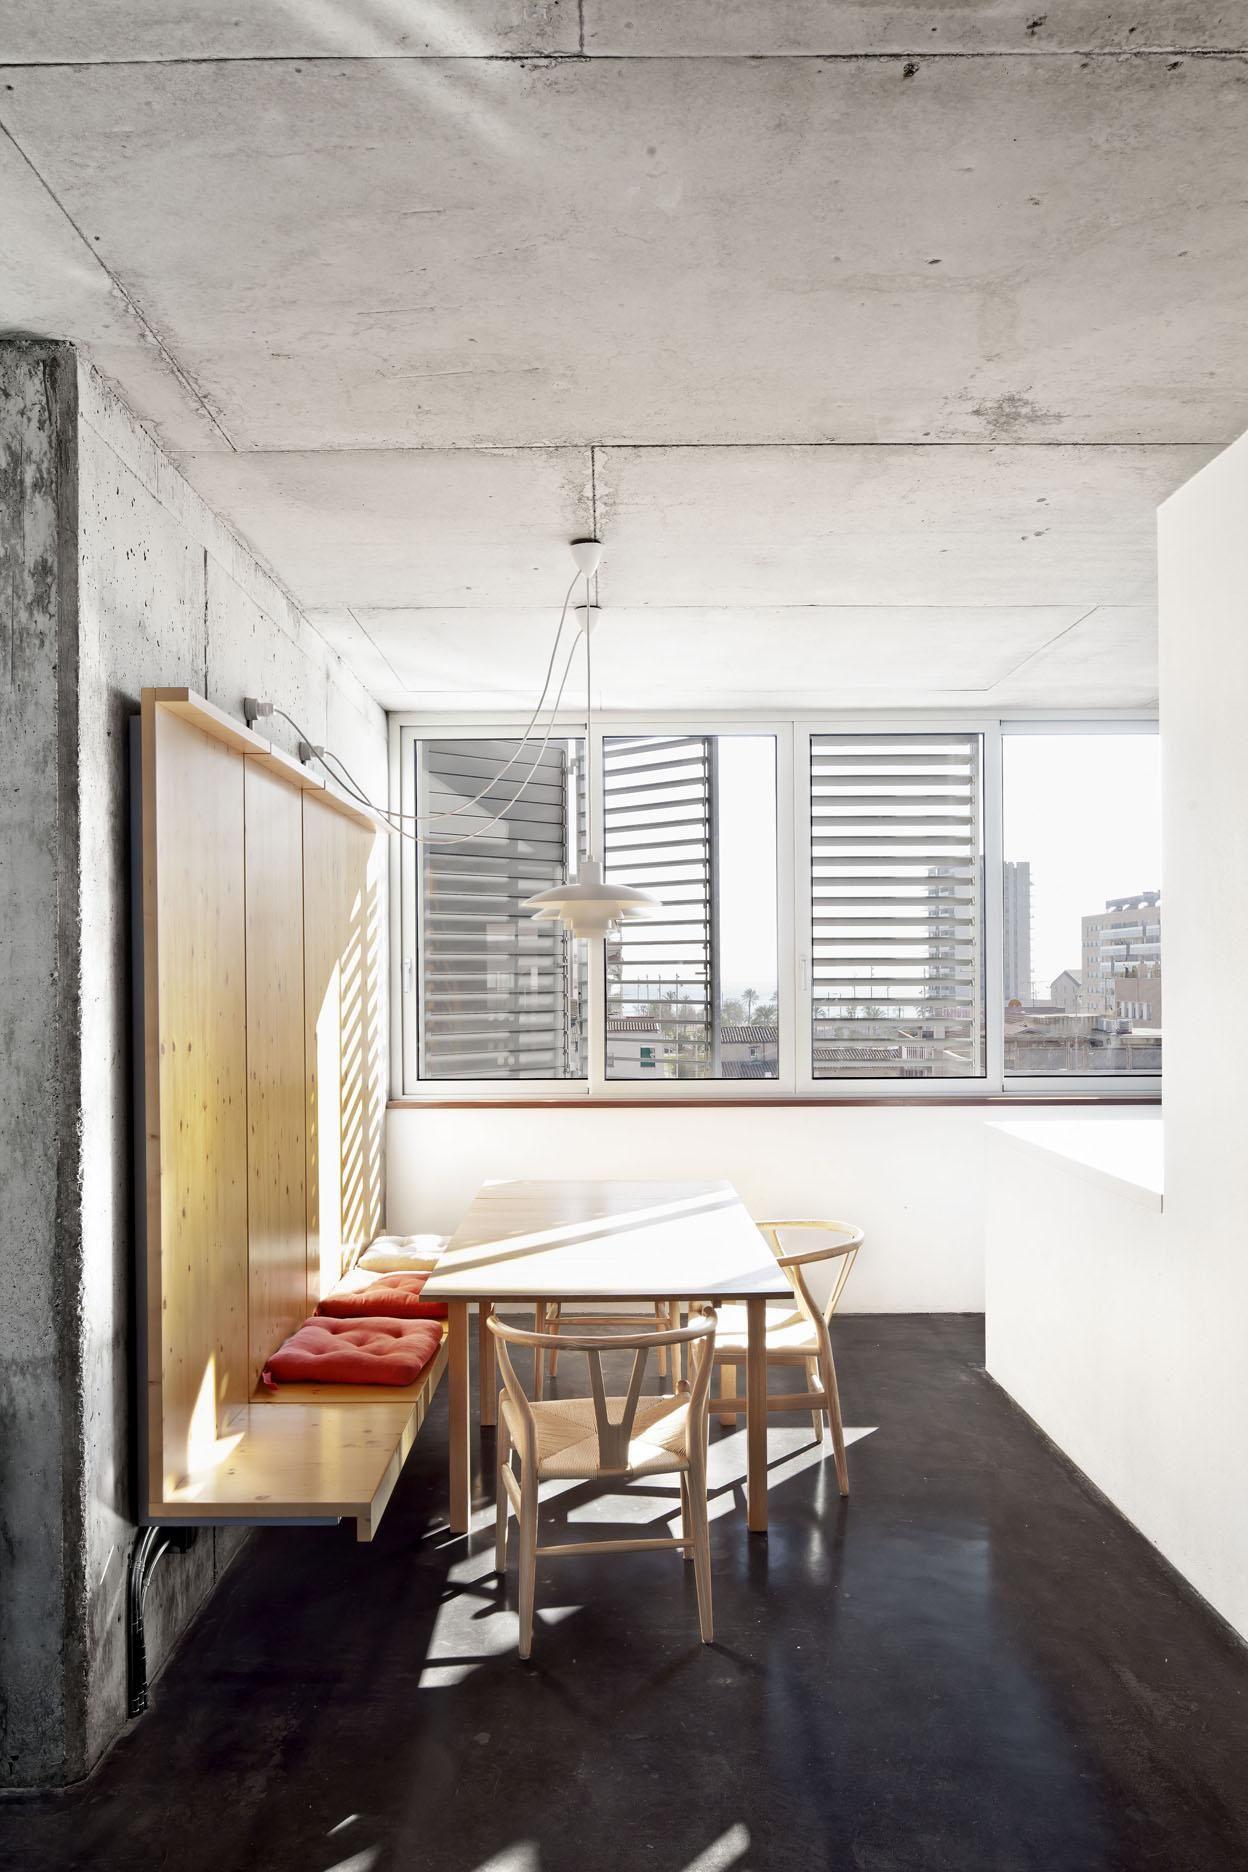 Multistorey dwelling building at Badalona Loft design